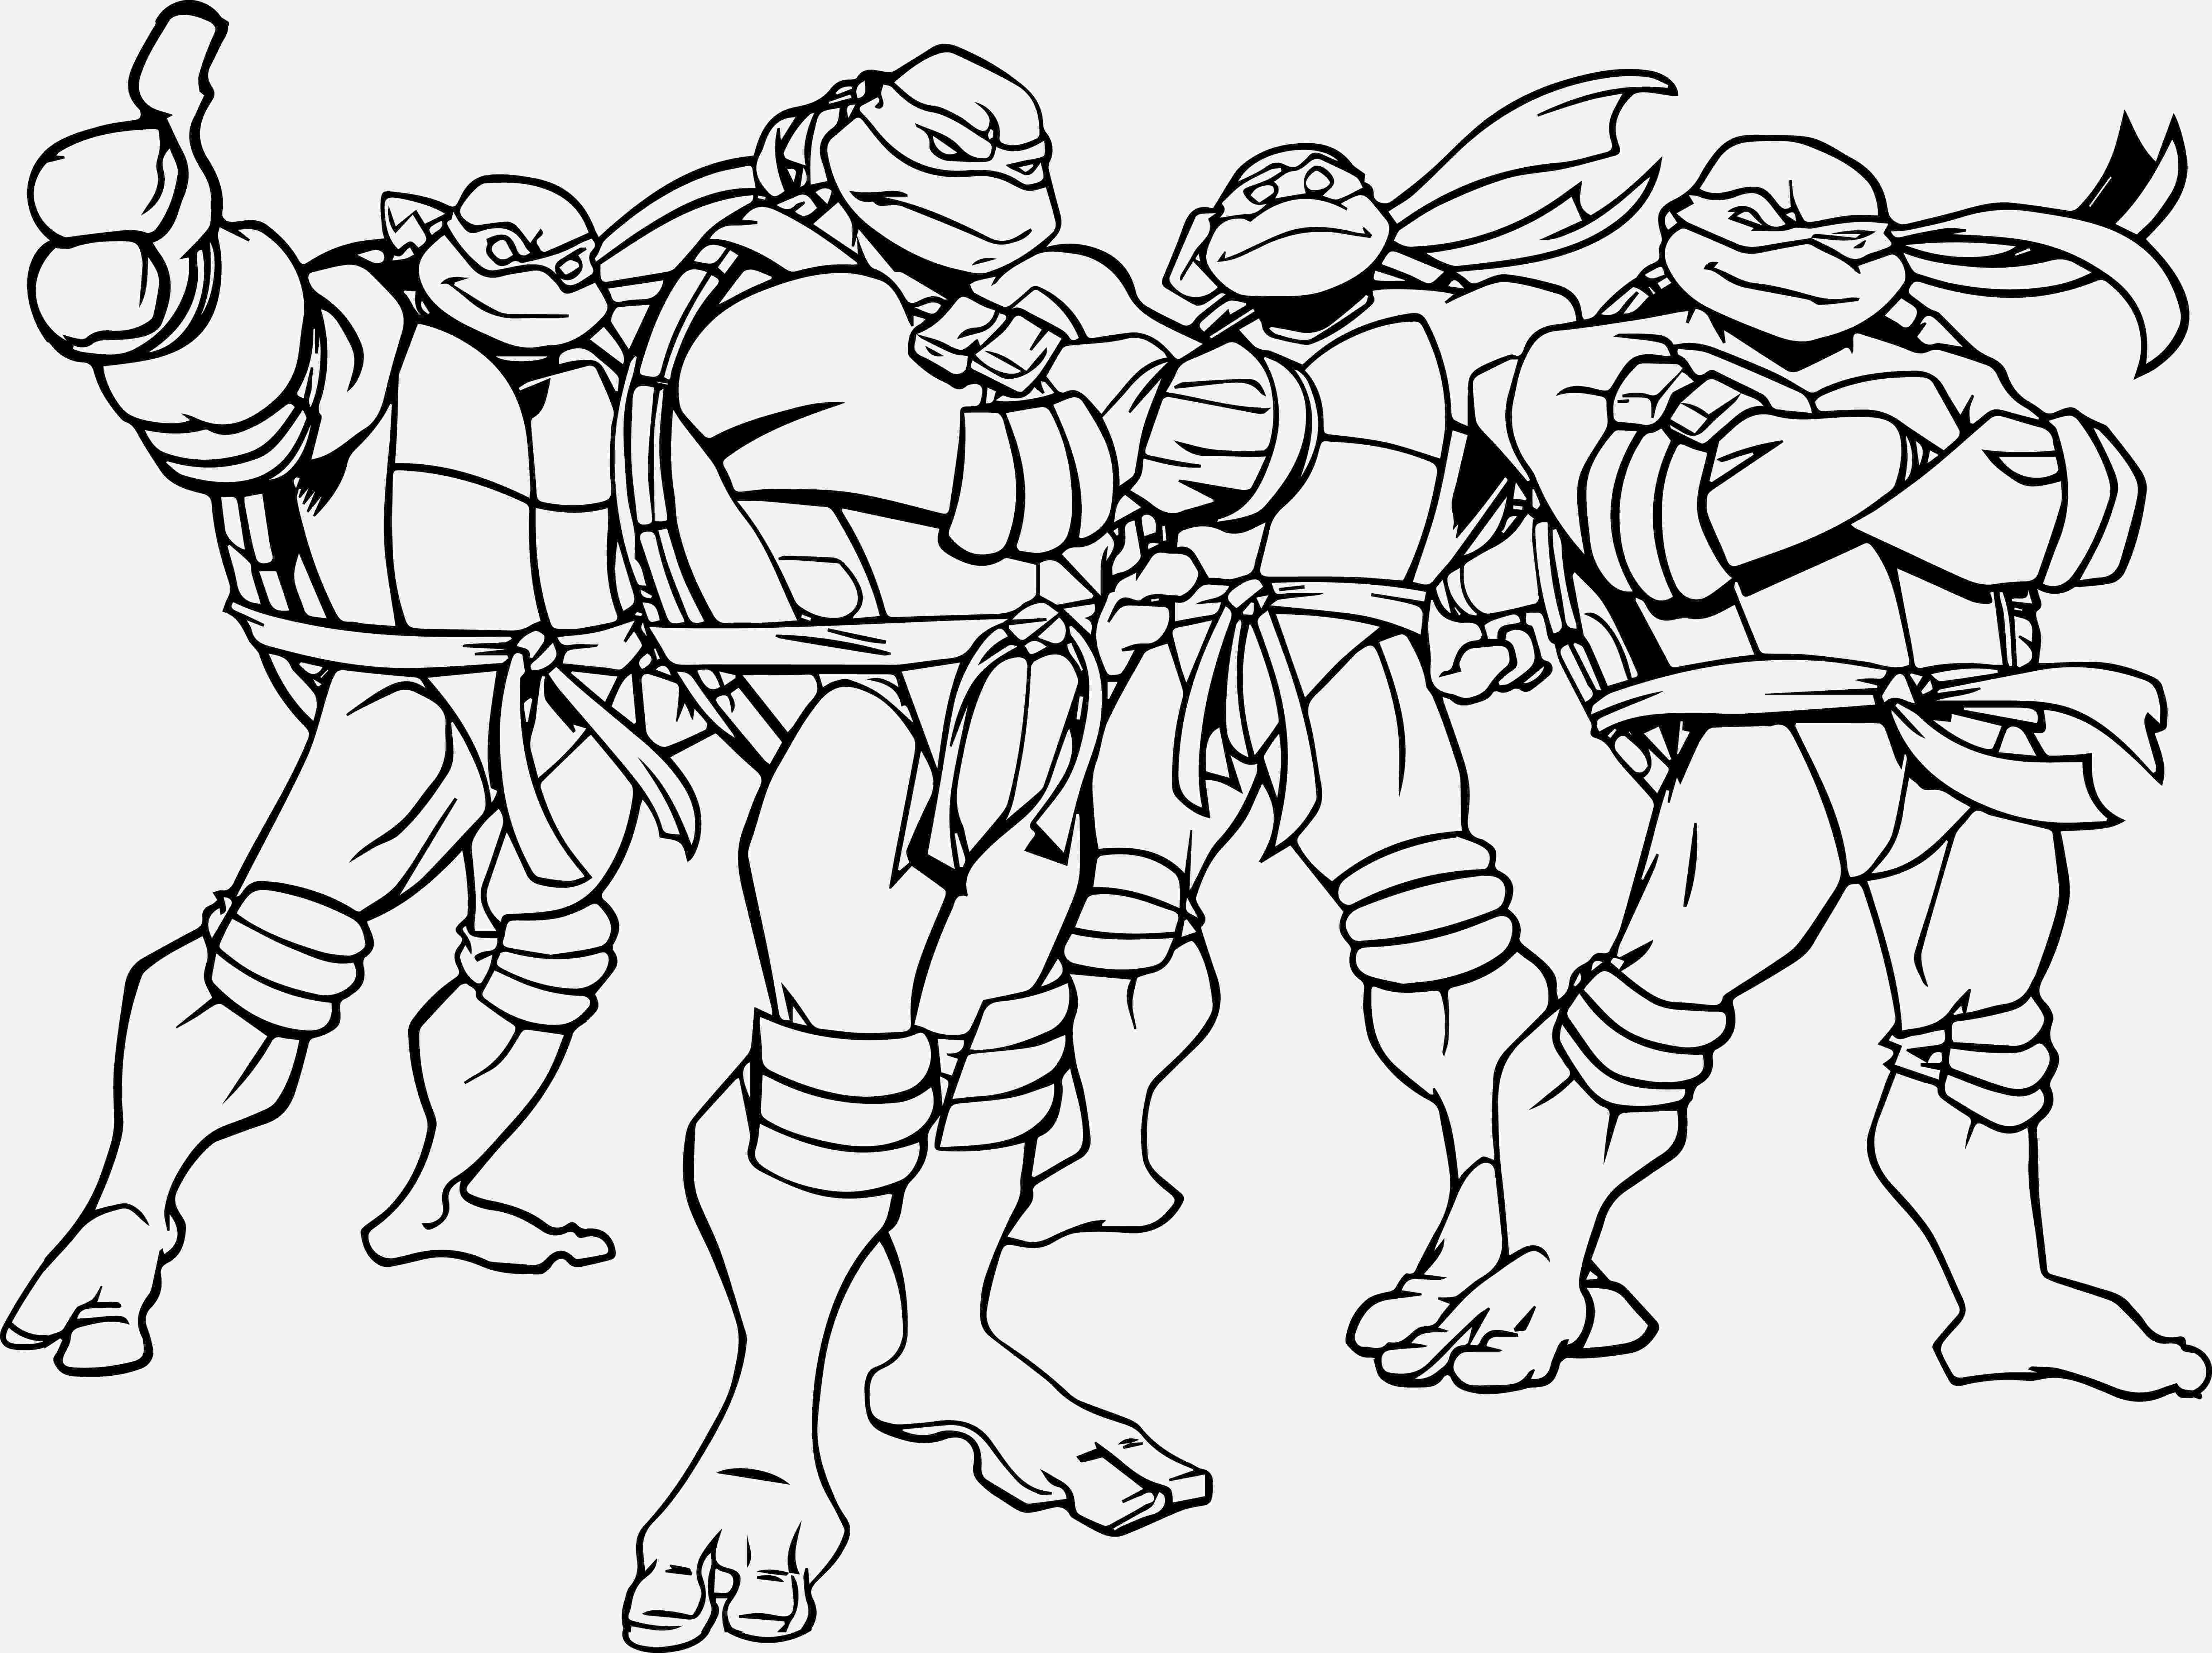 ninja turtles coloring pages printables sara dunkerton illustration and animation teenage mutant ninja turtles printables pages coloring